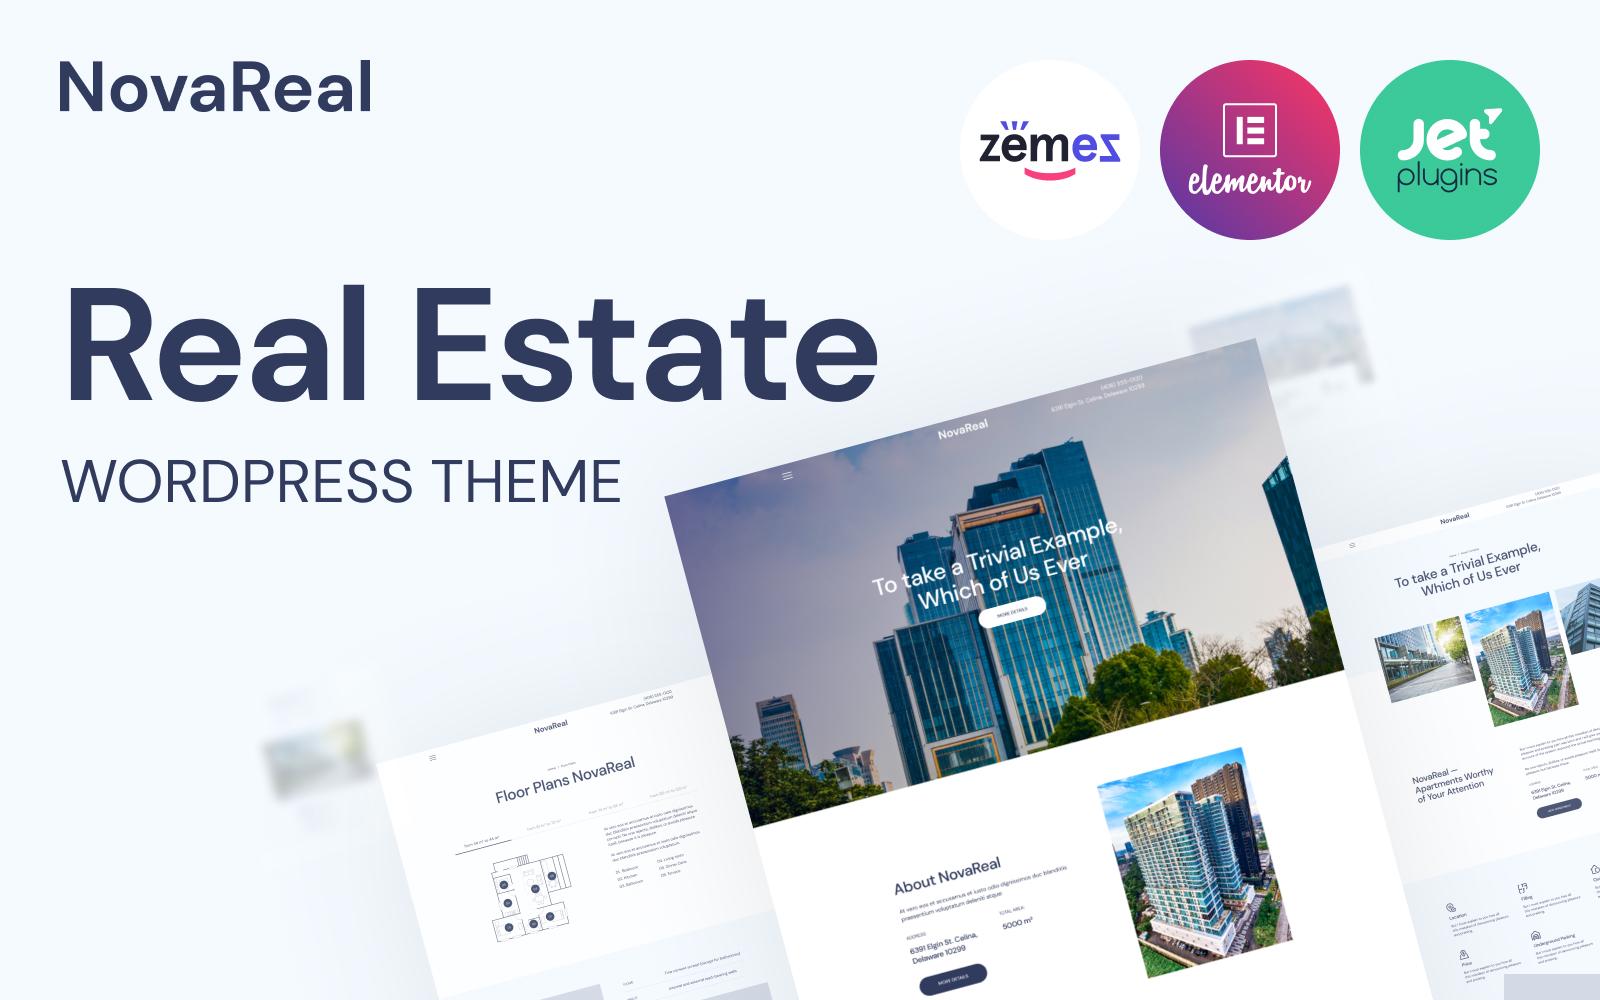 Nova Real - Real Estate Company WordPress theme